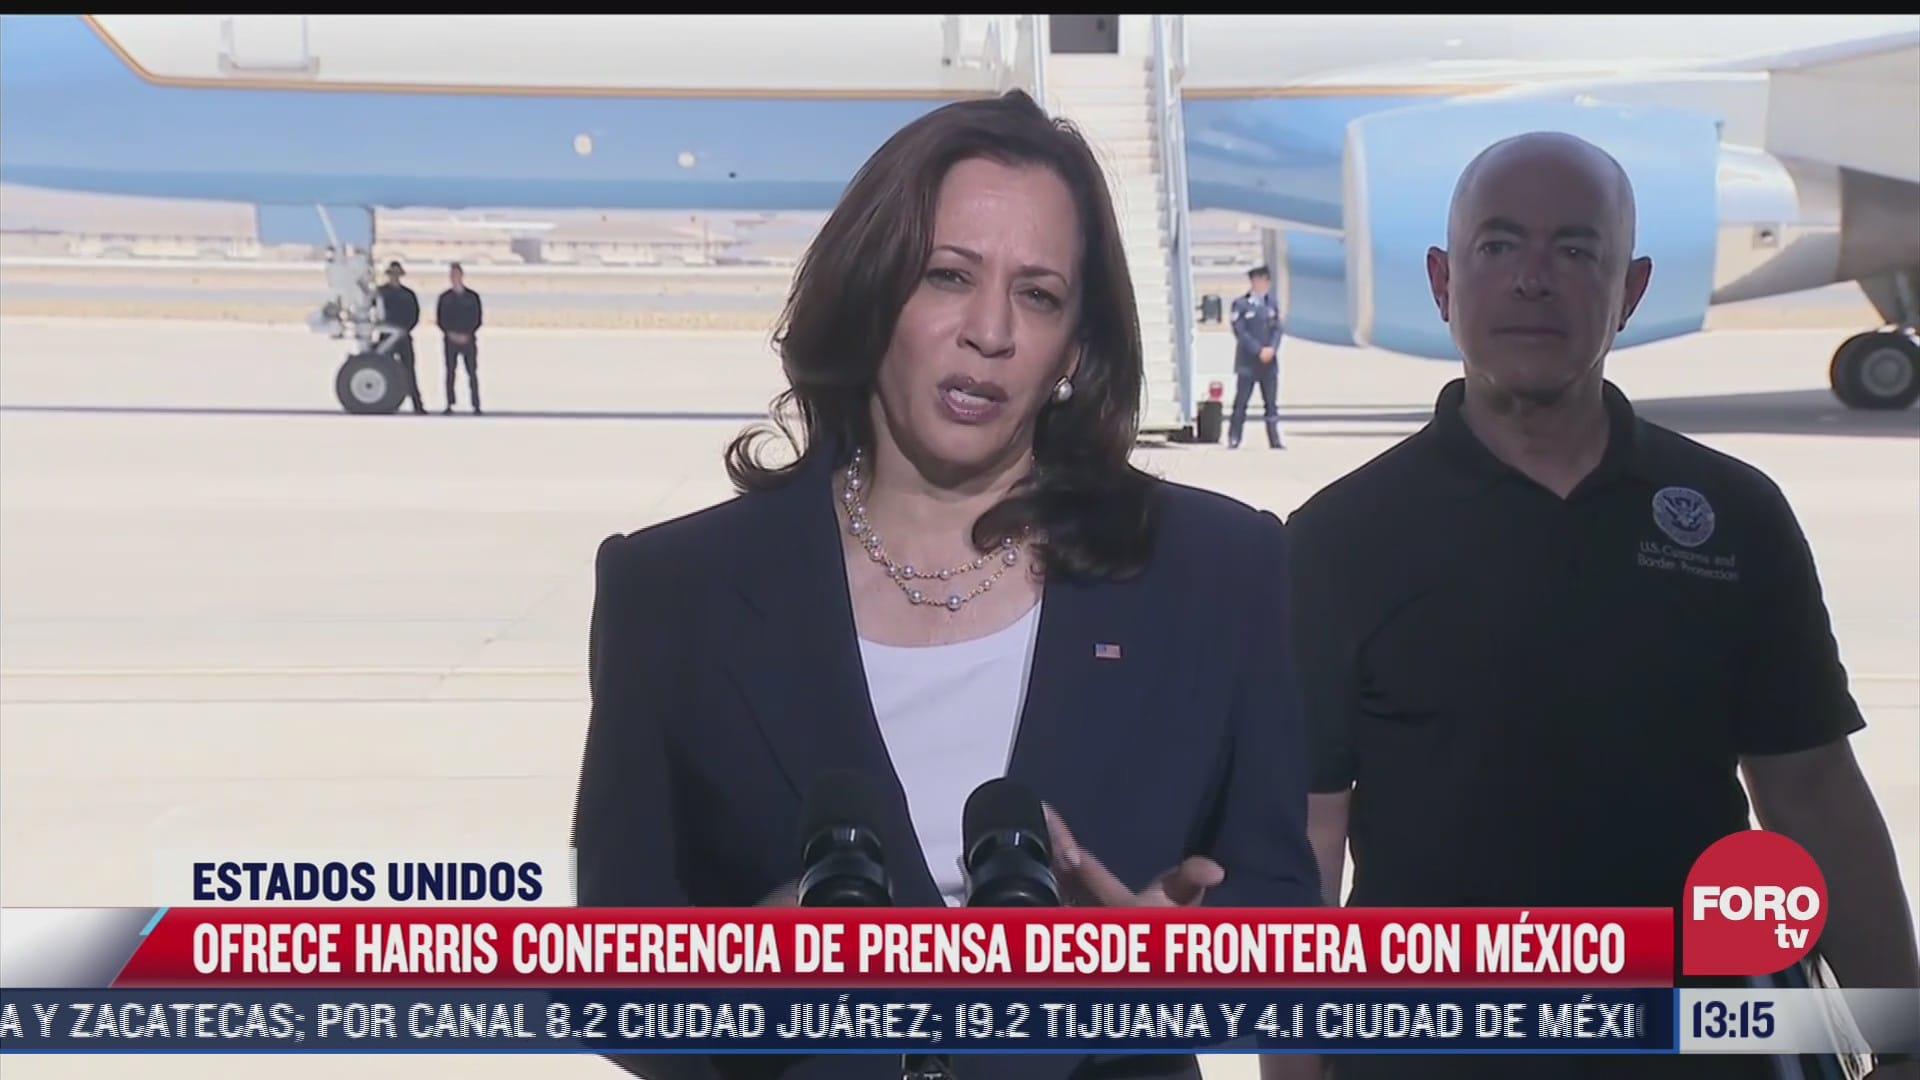 kamala harris supervisa puerto de entrada en frontera con mexico